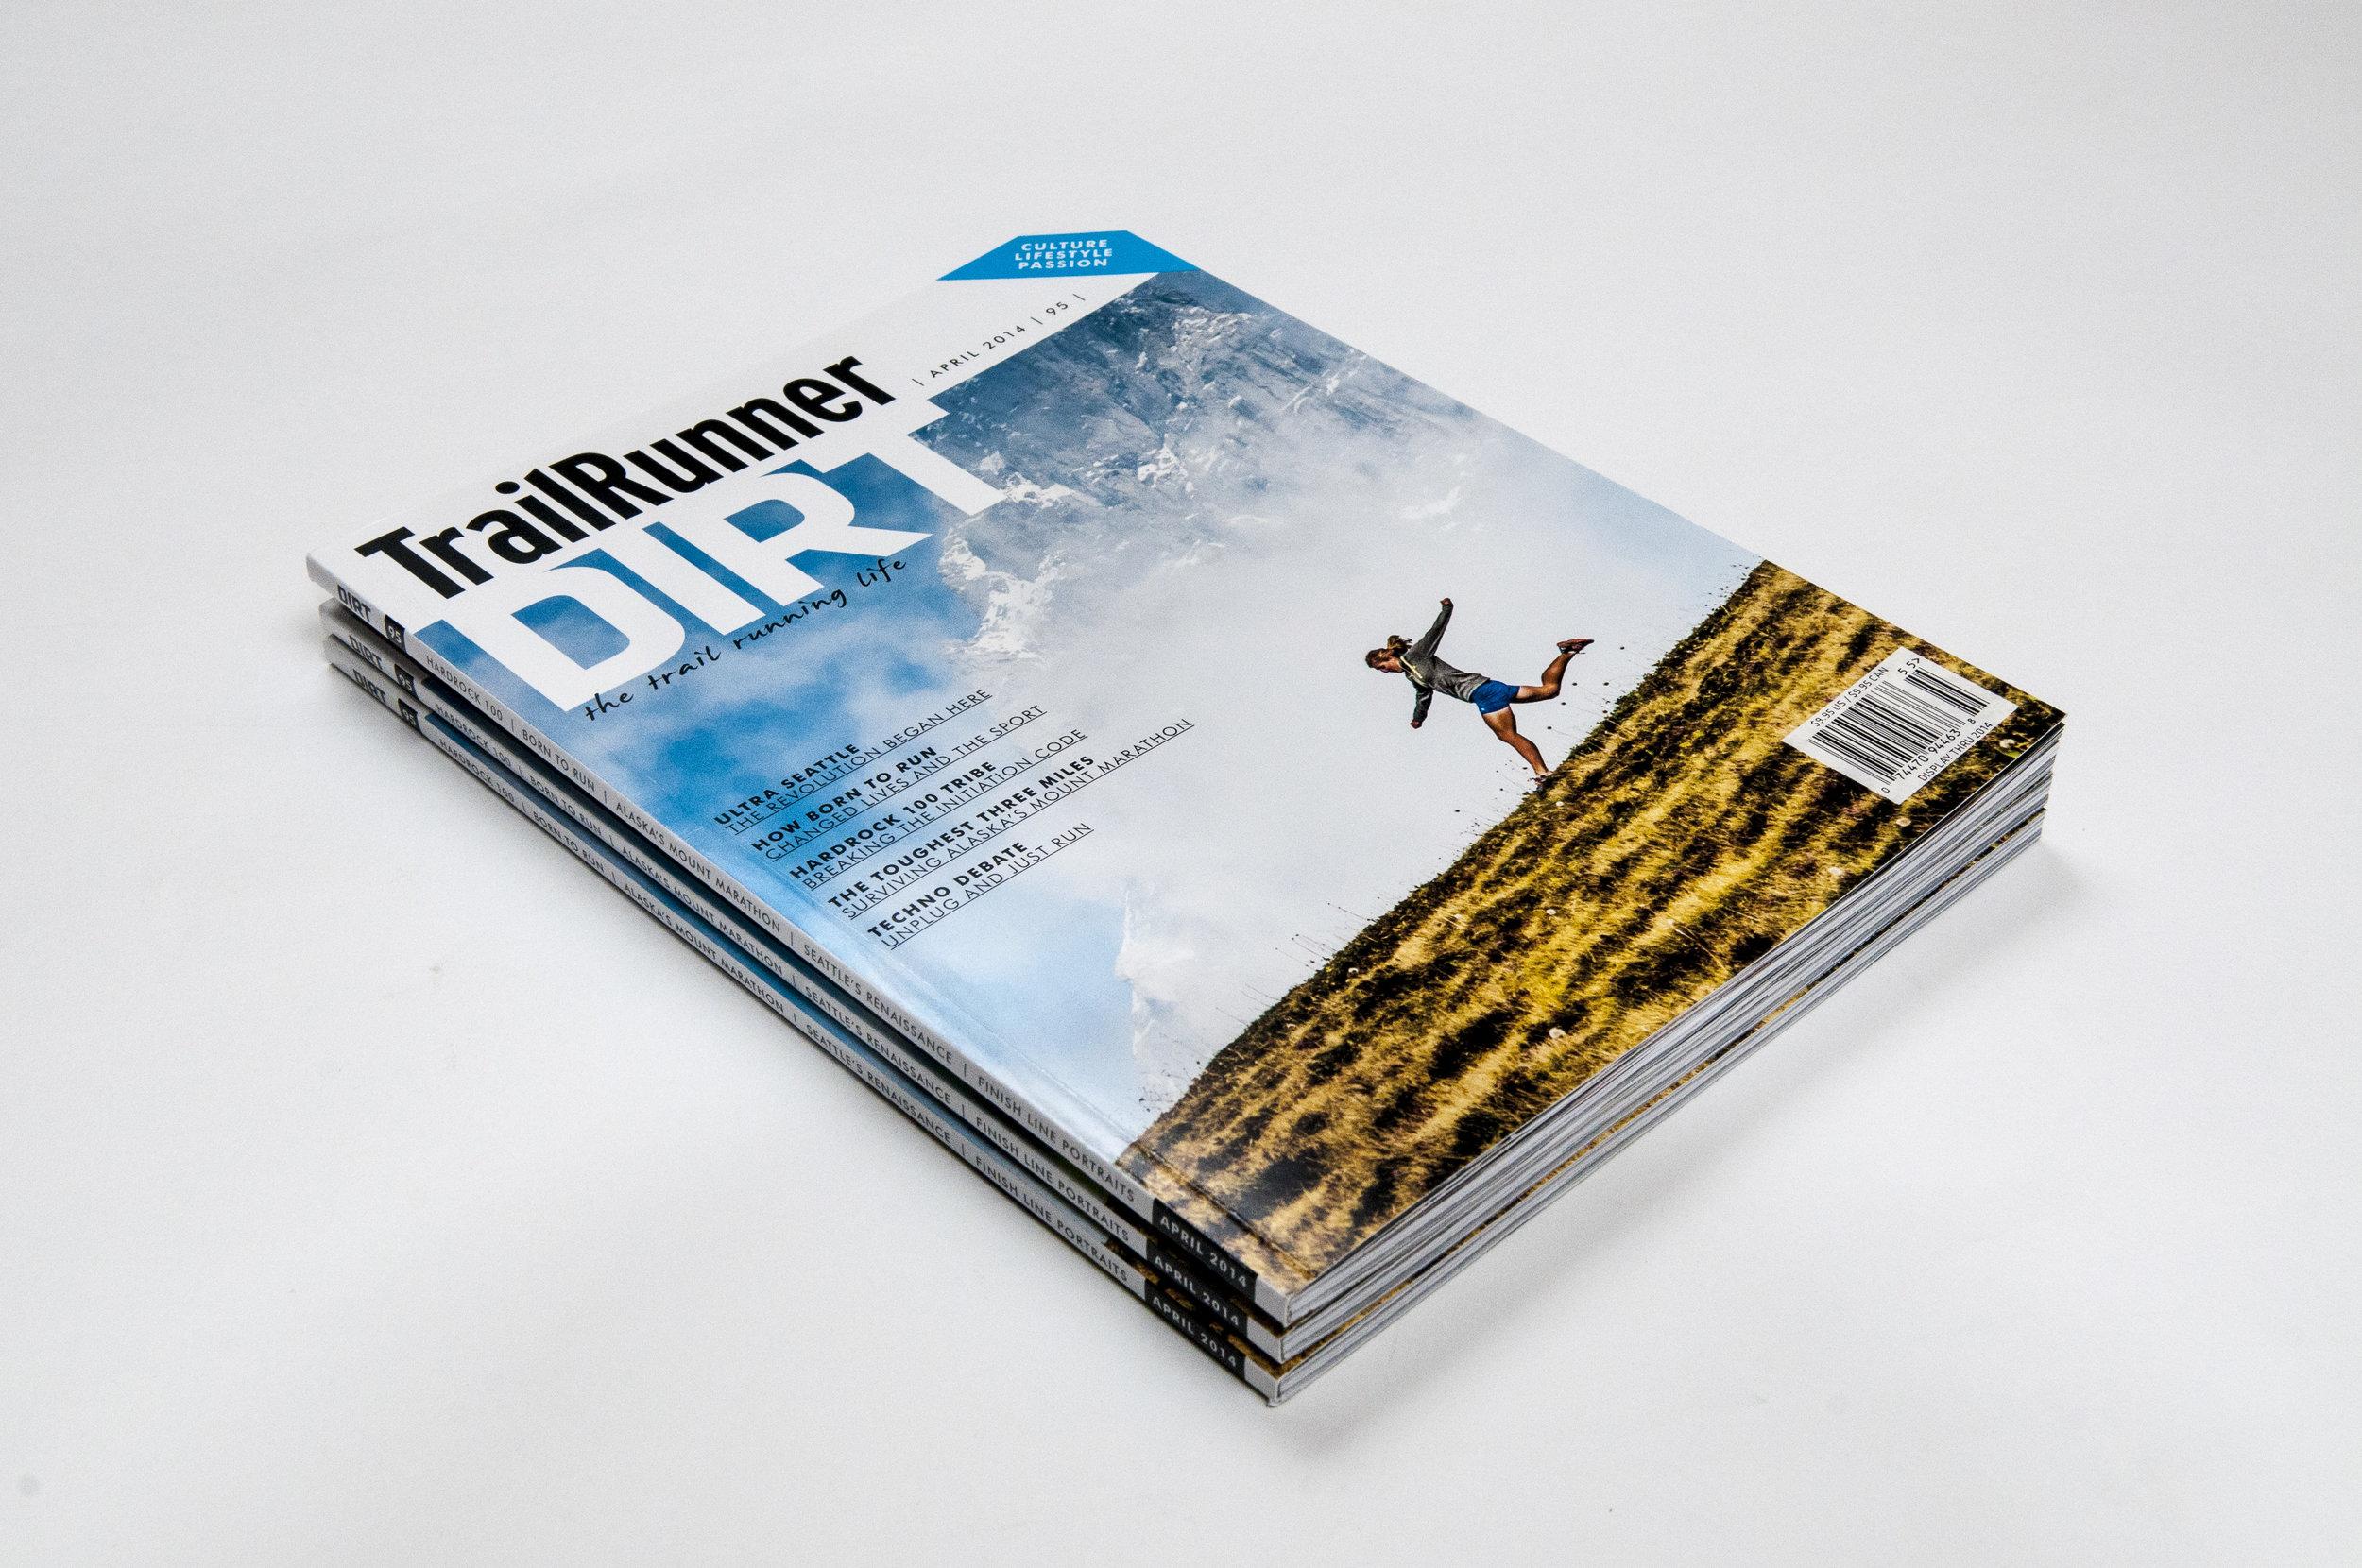 Dirt Annual by Trail Runner Magazine